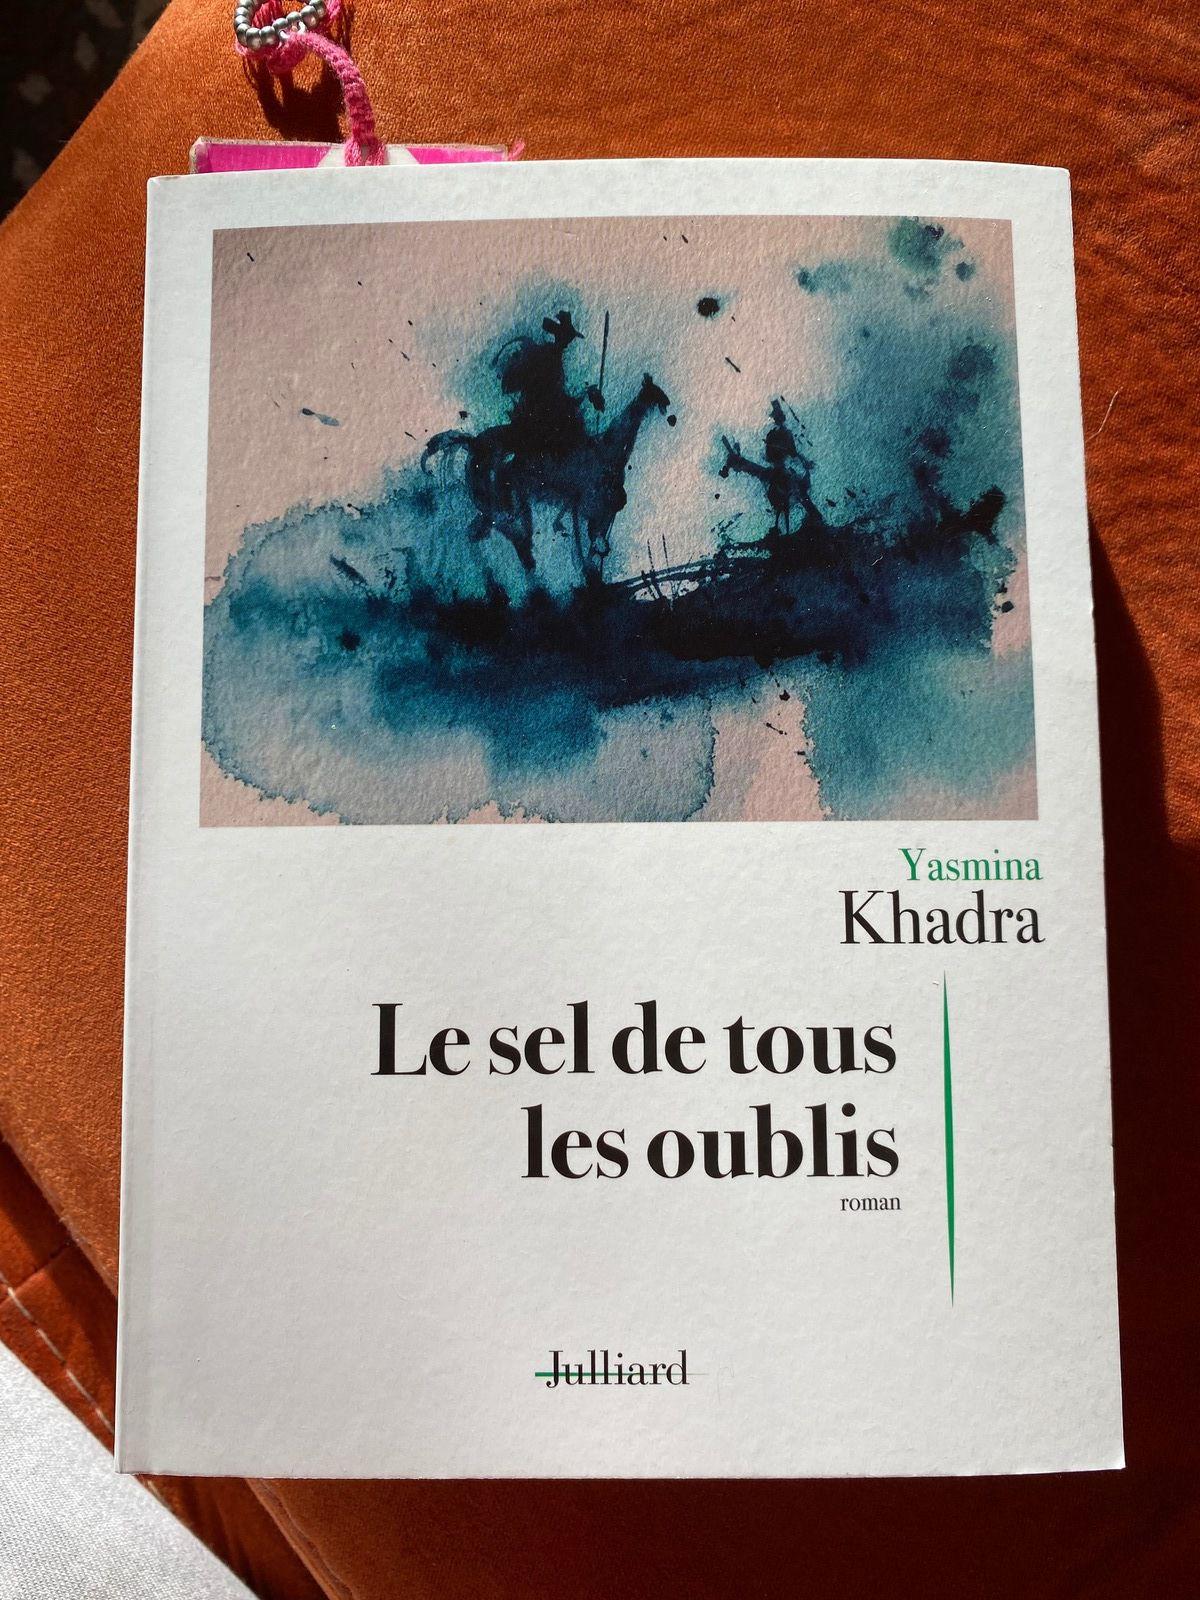 Ed Julliard, couverture de Amine Ouchene